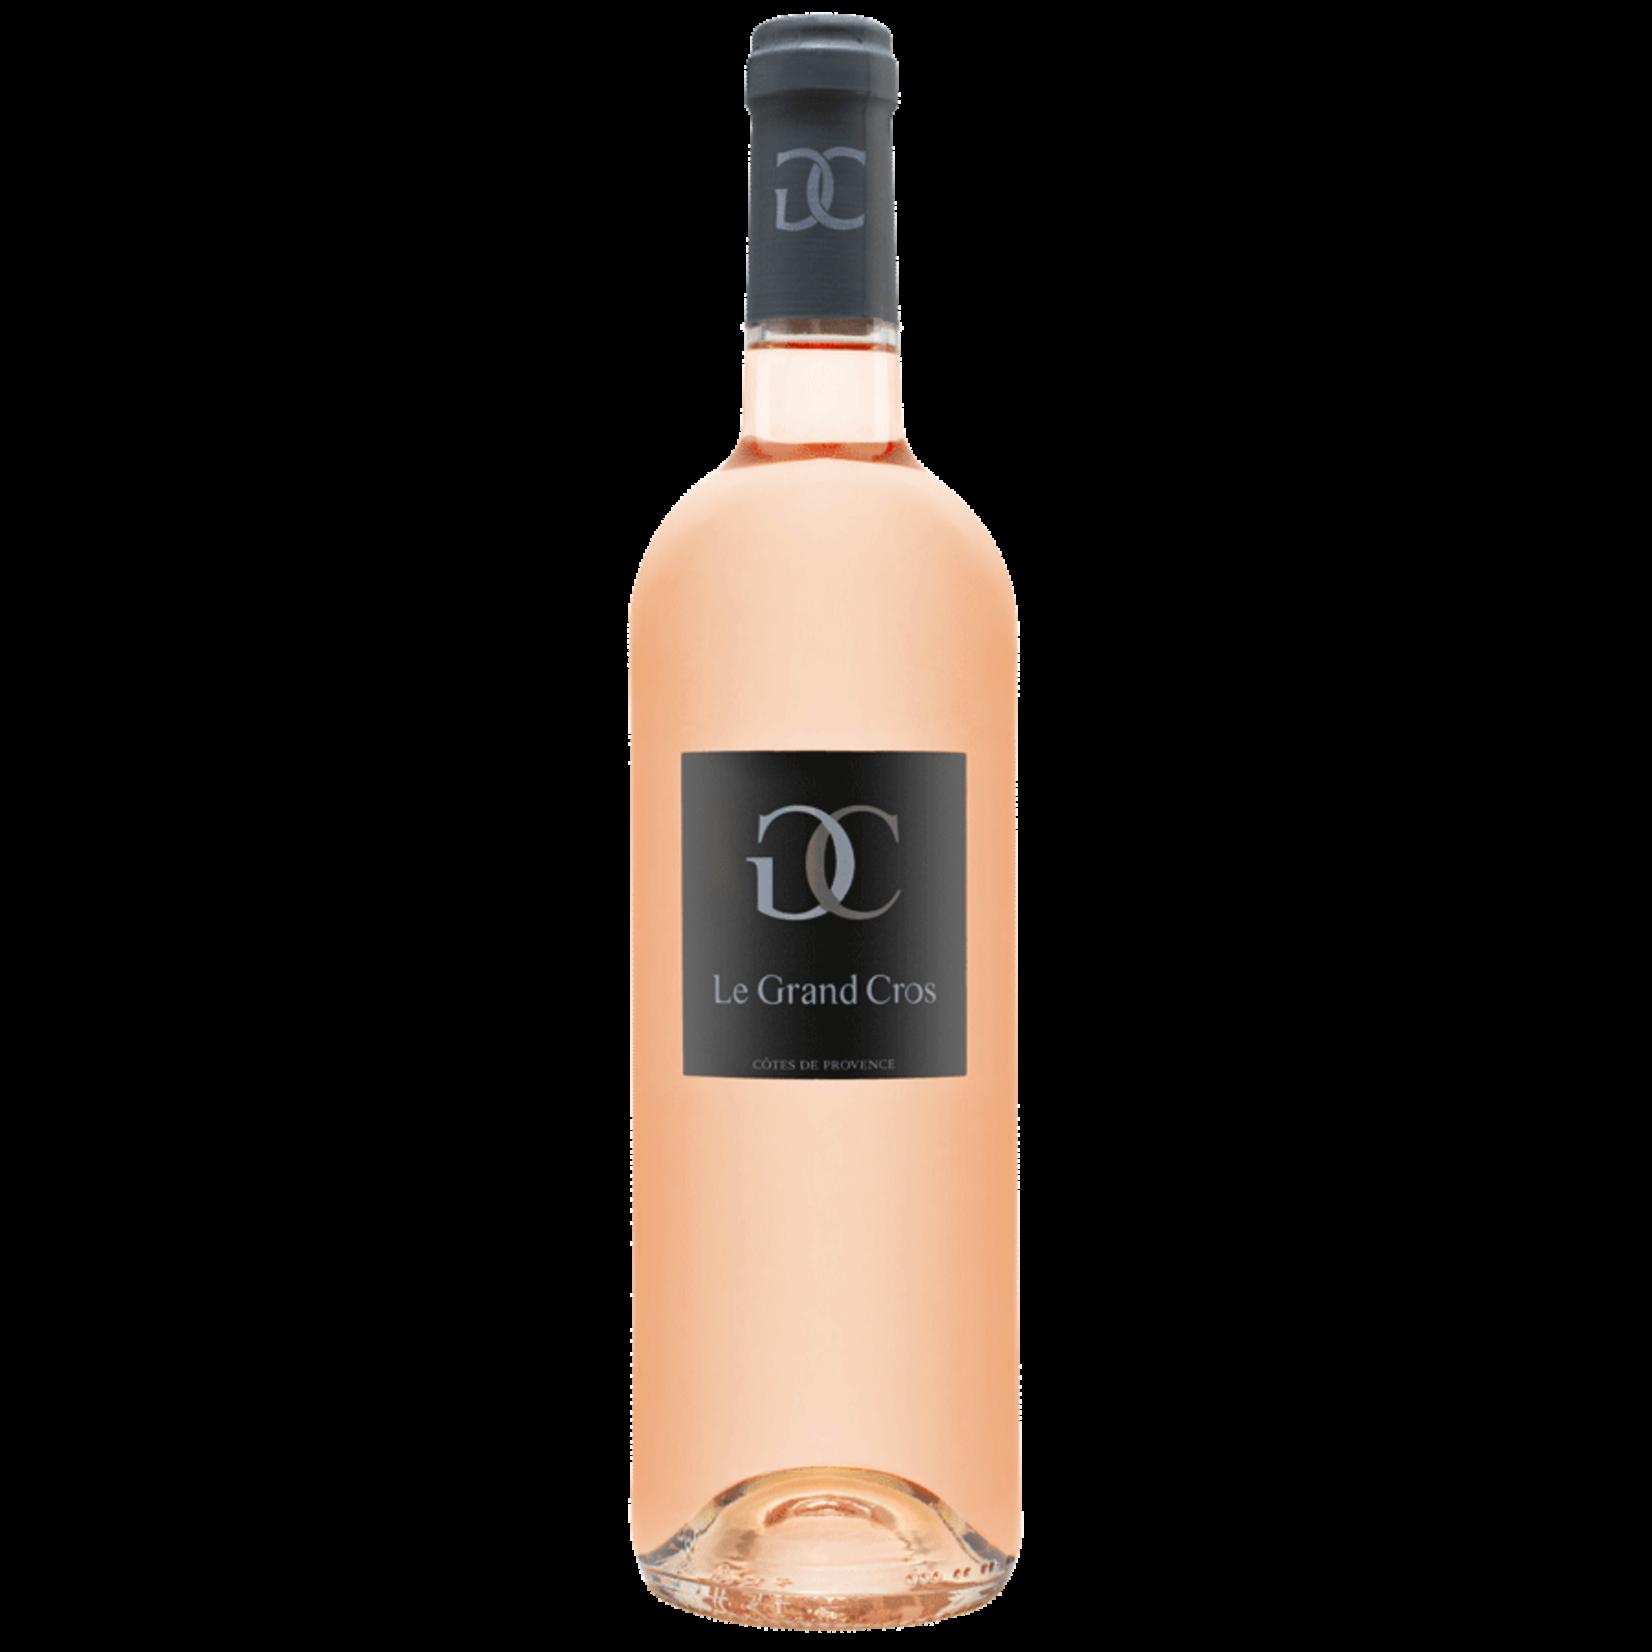 Wine Le Grand Cros Cotes de Provence Rose 2018